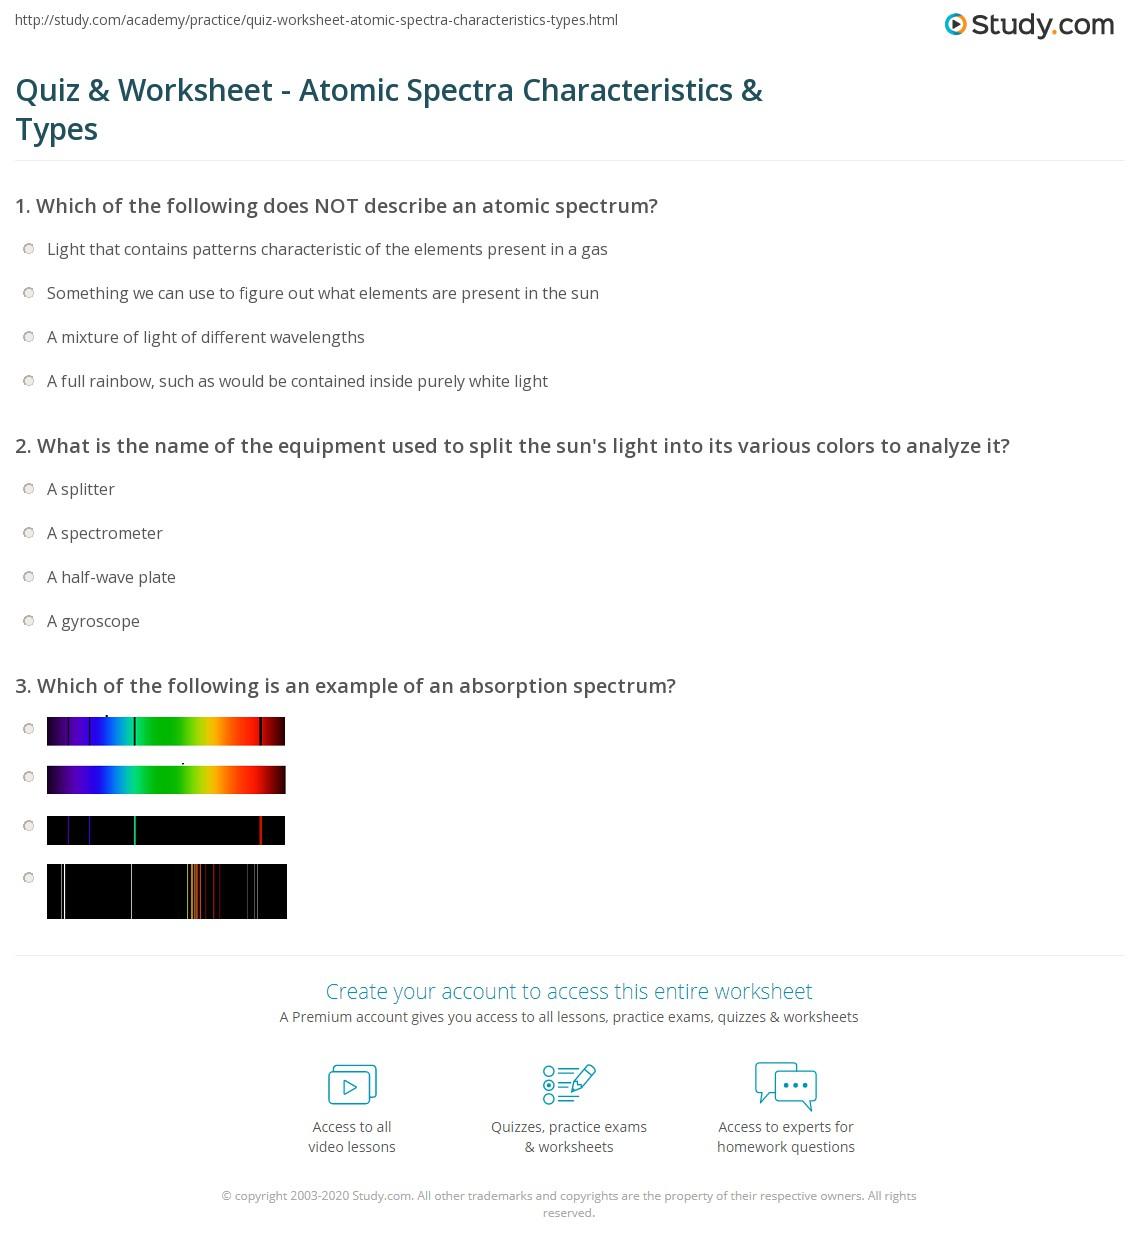 quiz worksheet atomic spectra characteristics types. Black Bedroom Furniture Sets. Home Design Ideas